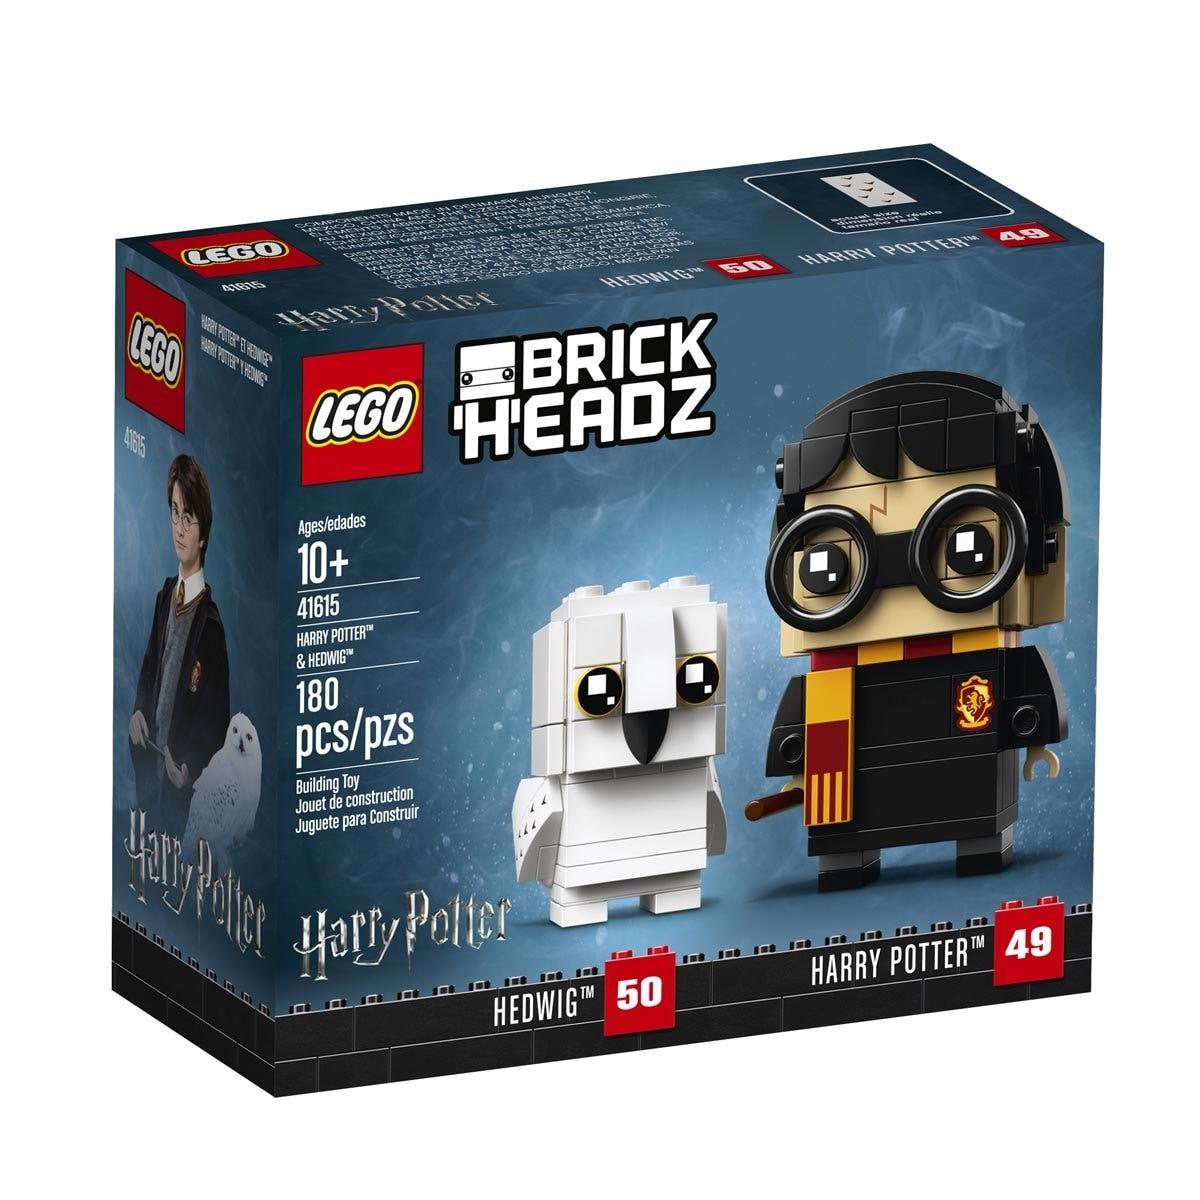 Brickheadz Harry Potter And Hedwig Lego